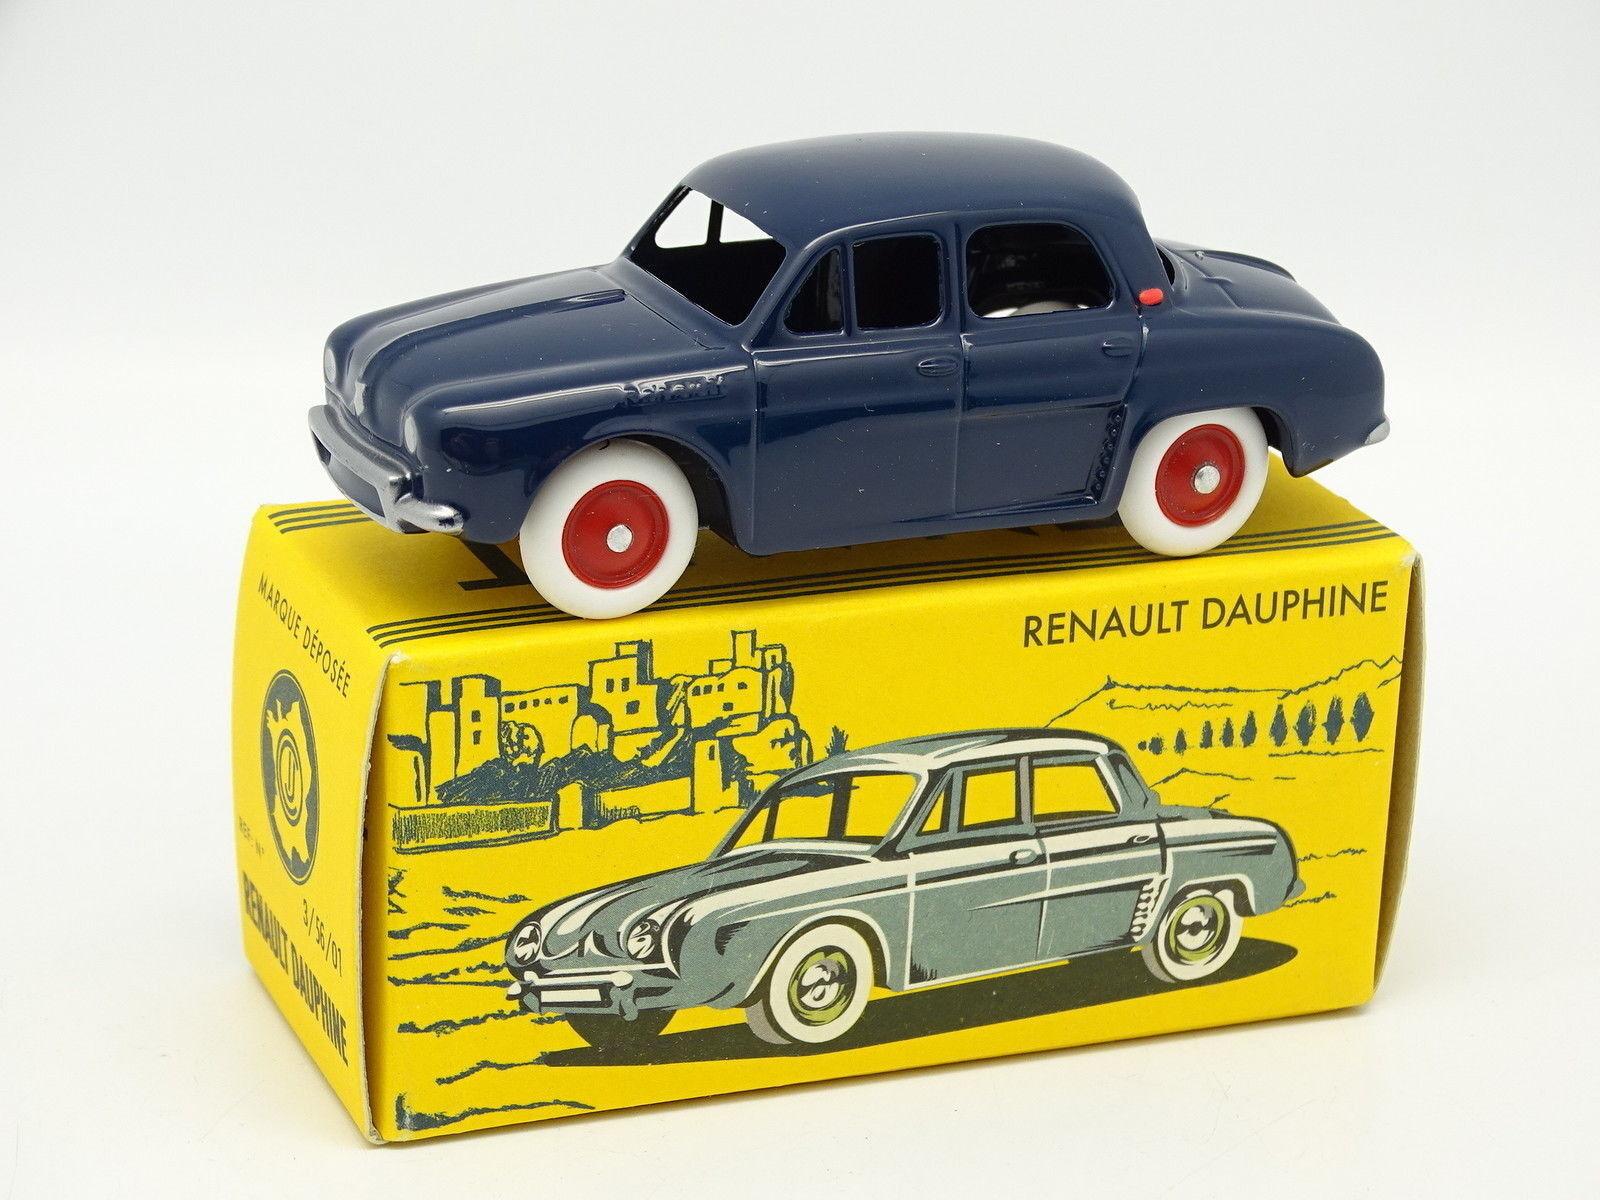 CIJ By Norev Norev Norev 1 43 - Renault Dauphine blue 01224e